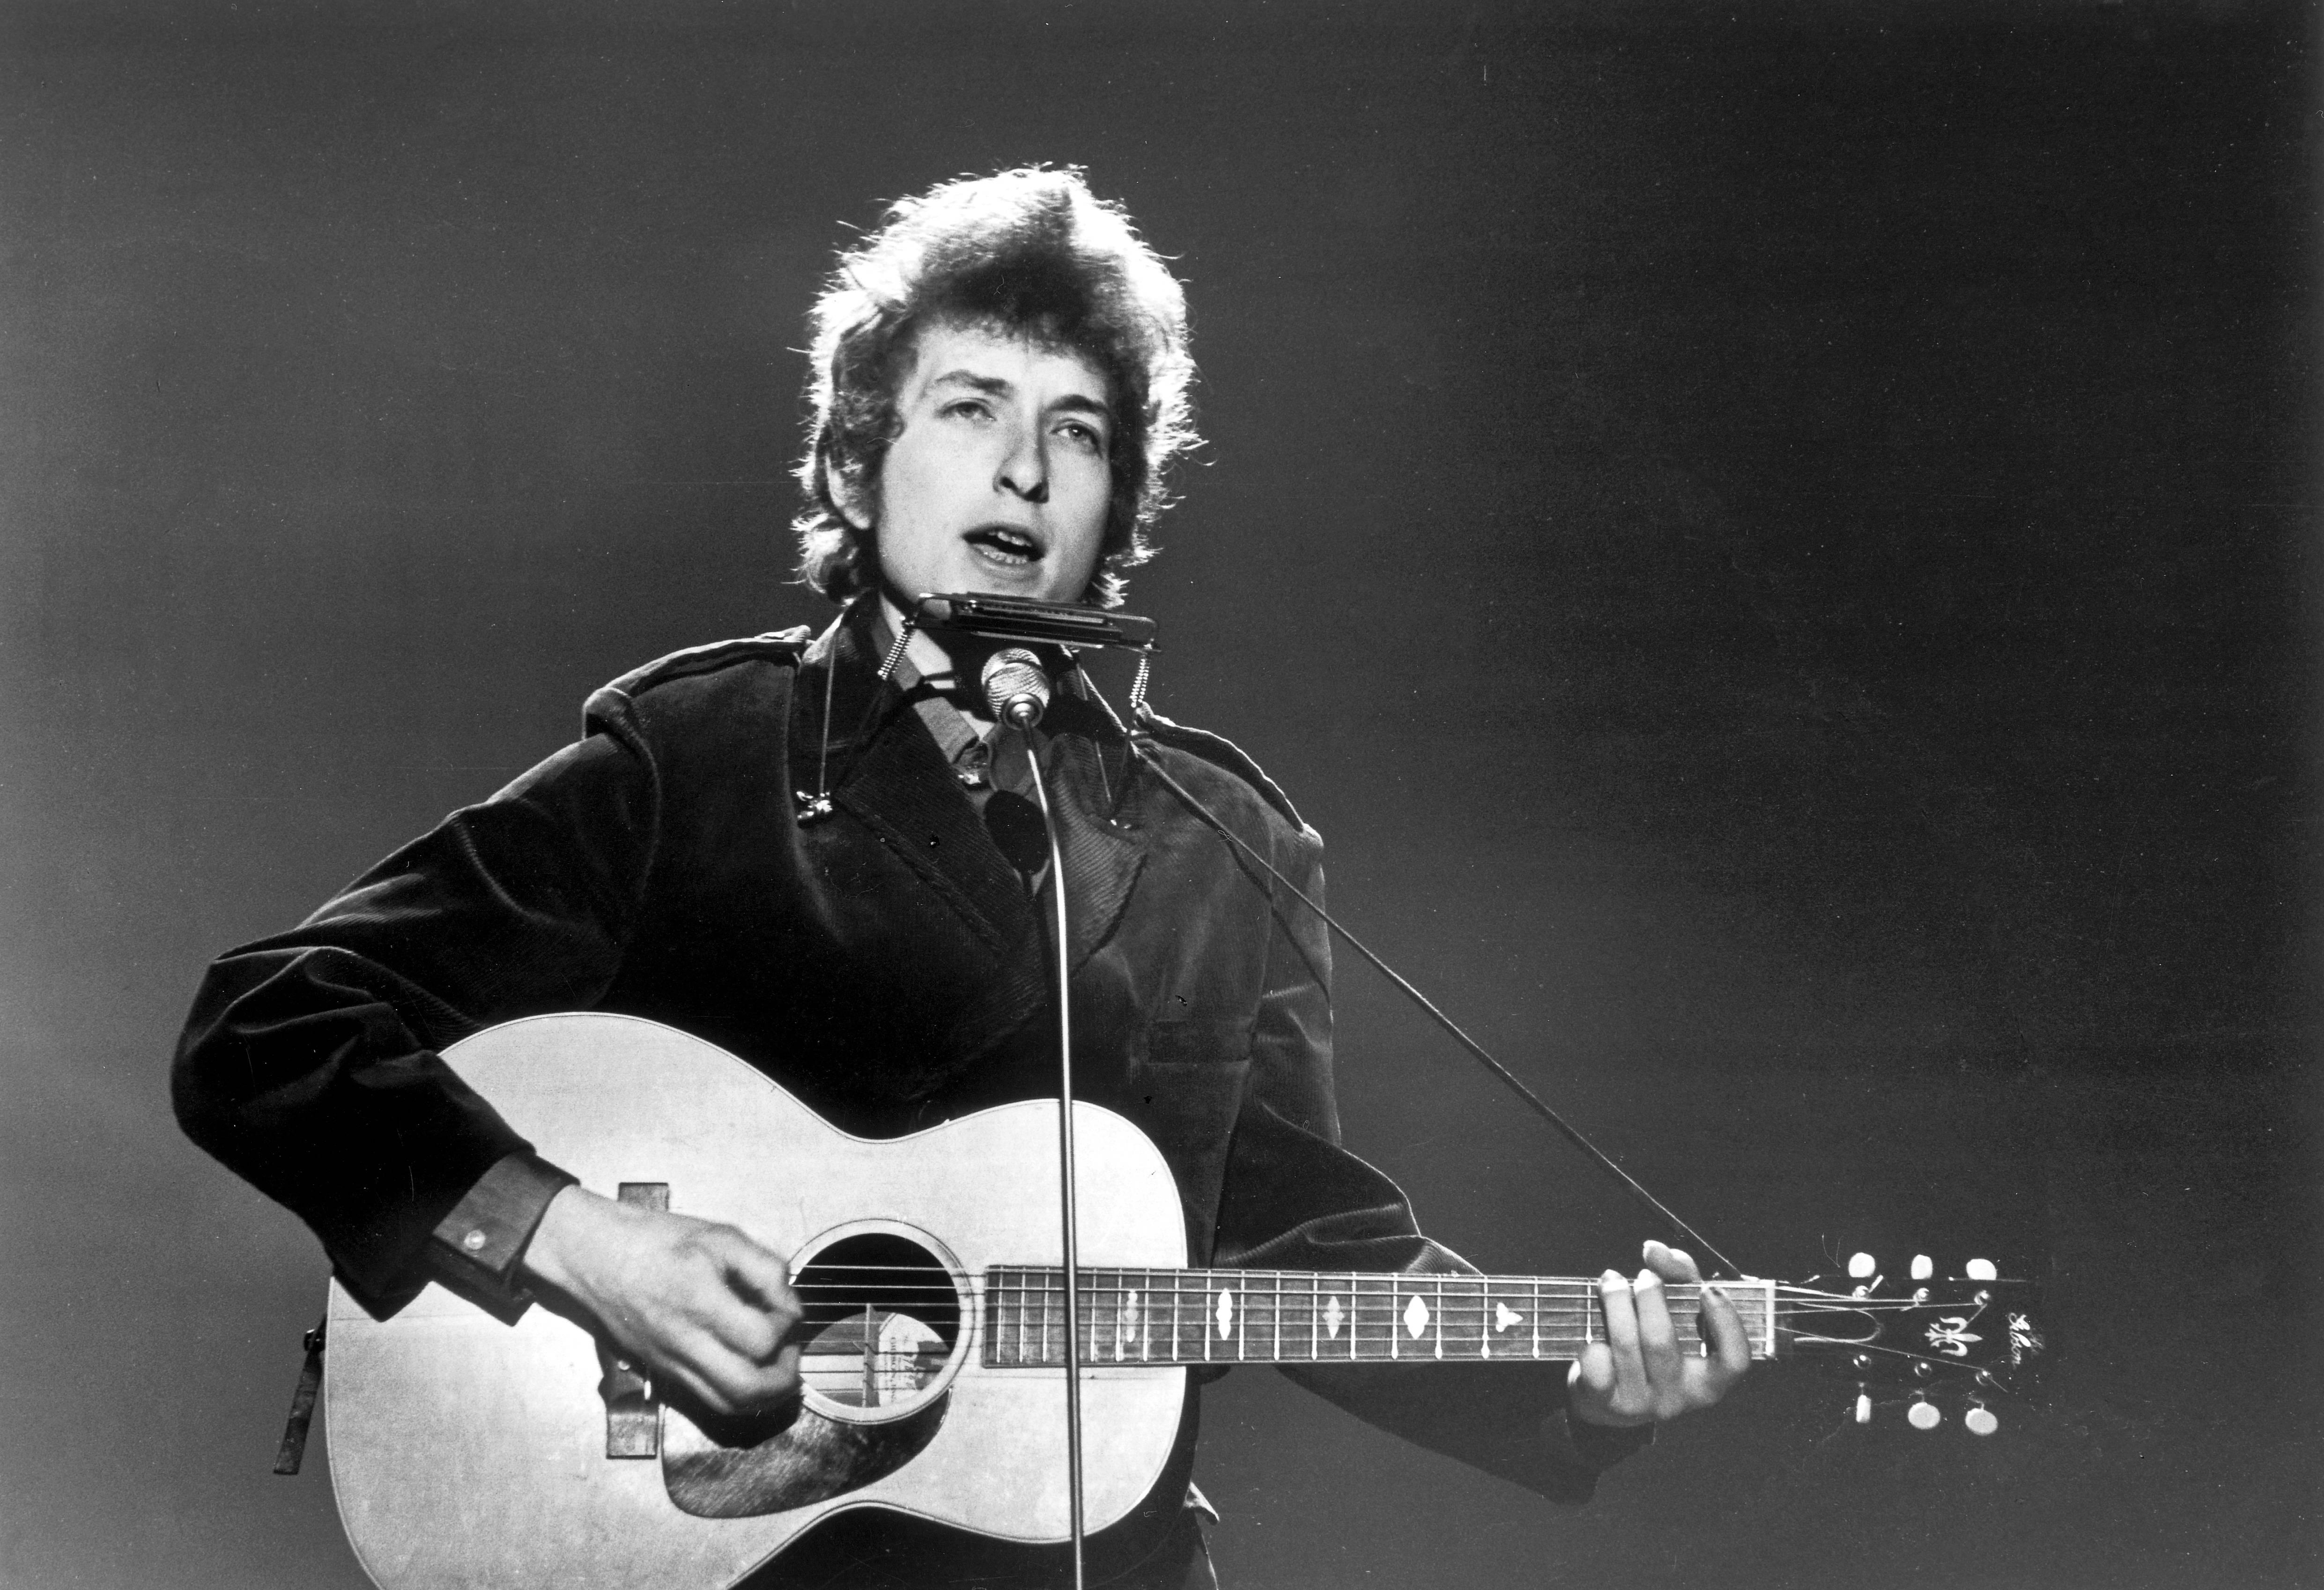 Swedish Scientists Hide Bob Dylan Lyrics in Scholarly Articles